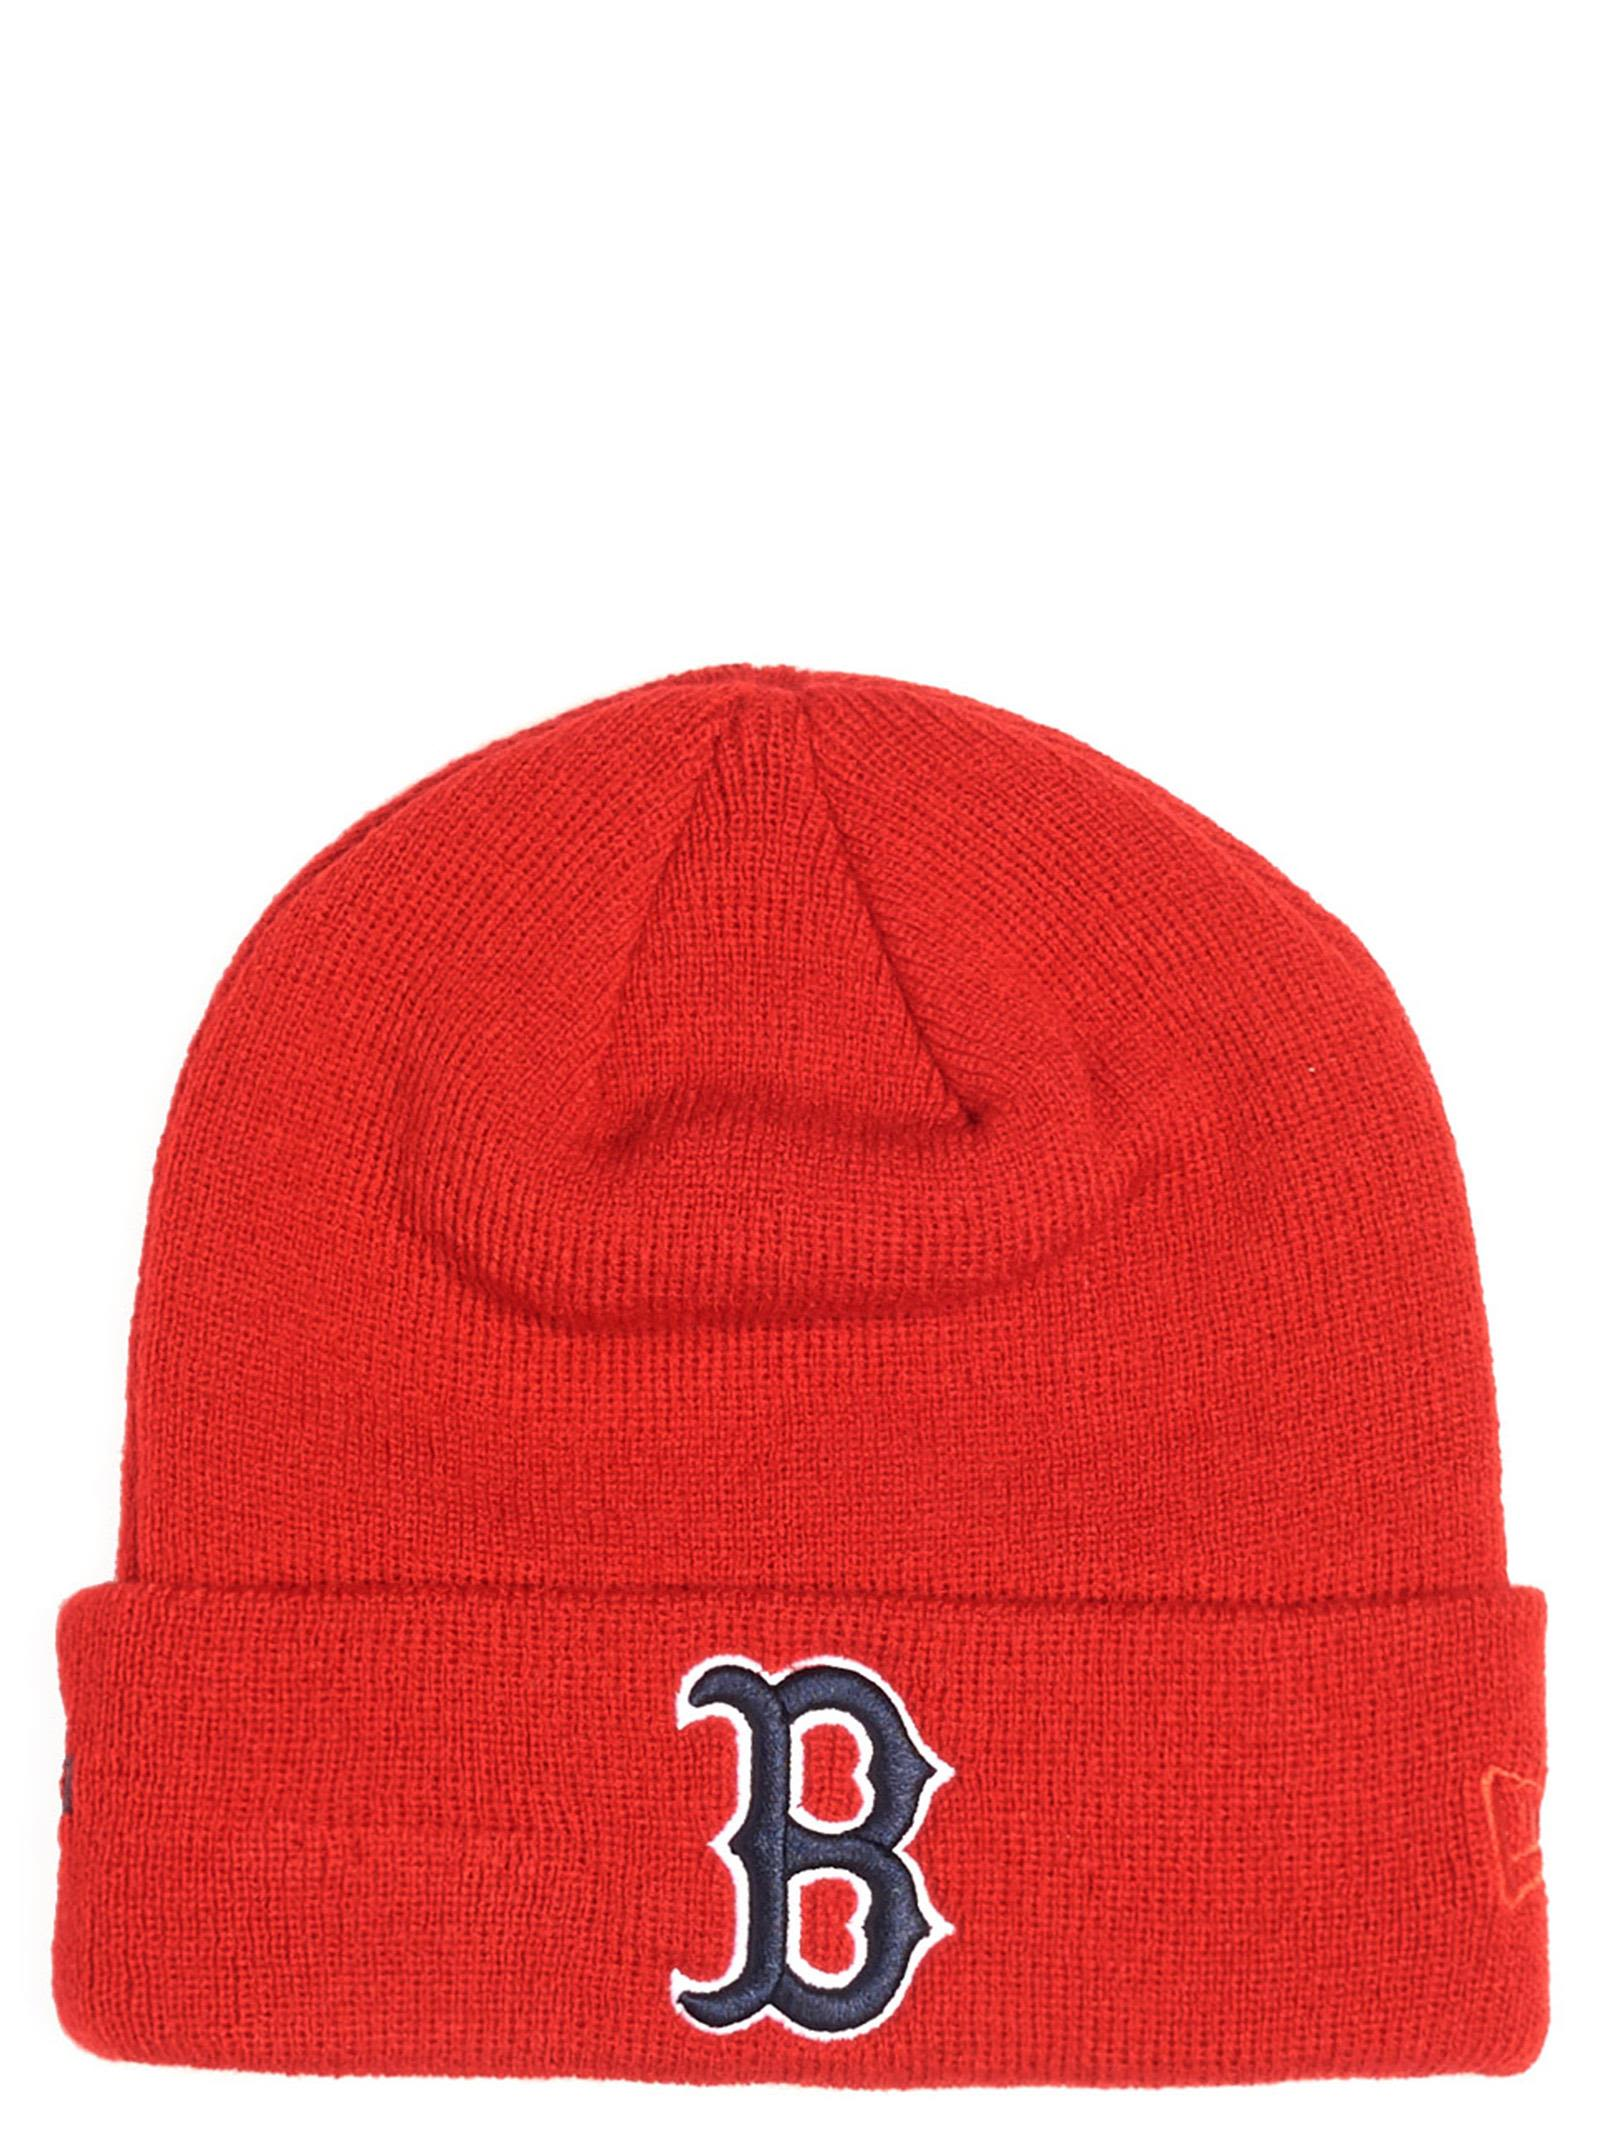 ac527fcd8a6693 Marcelo Burlon Marcelo Burlon 'ne Red Sox' Beanie - Red - 10754583 ...